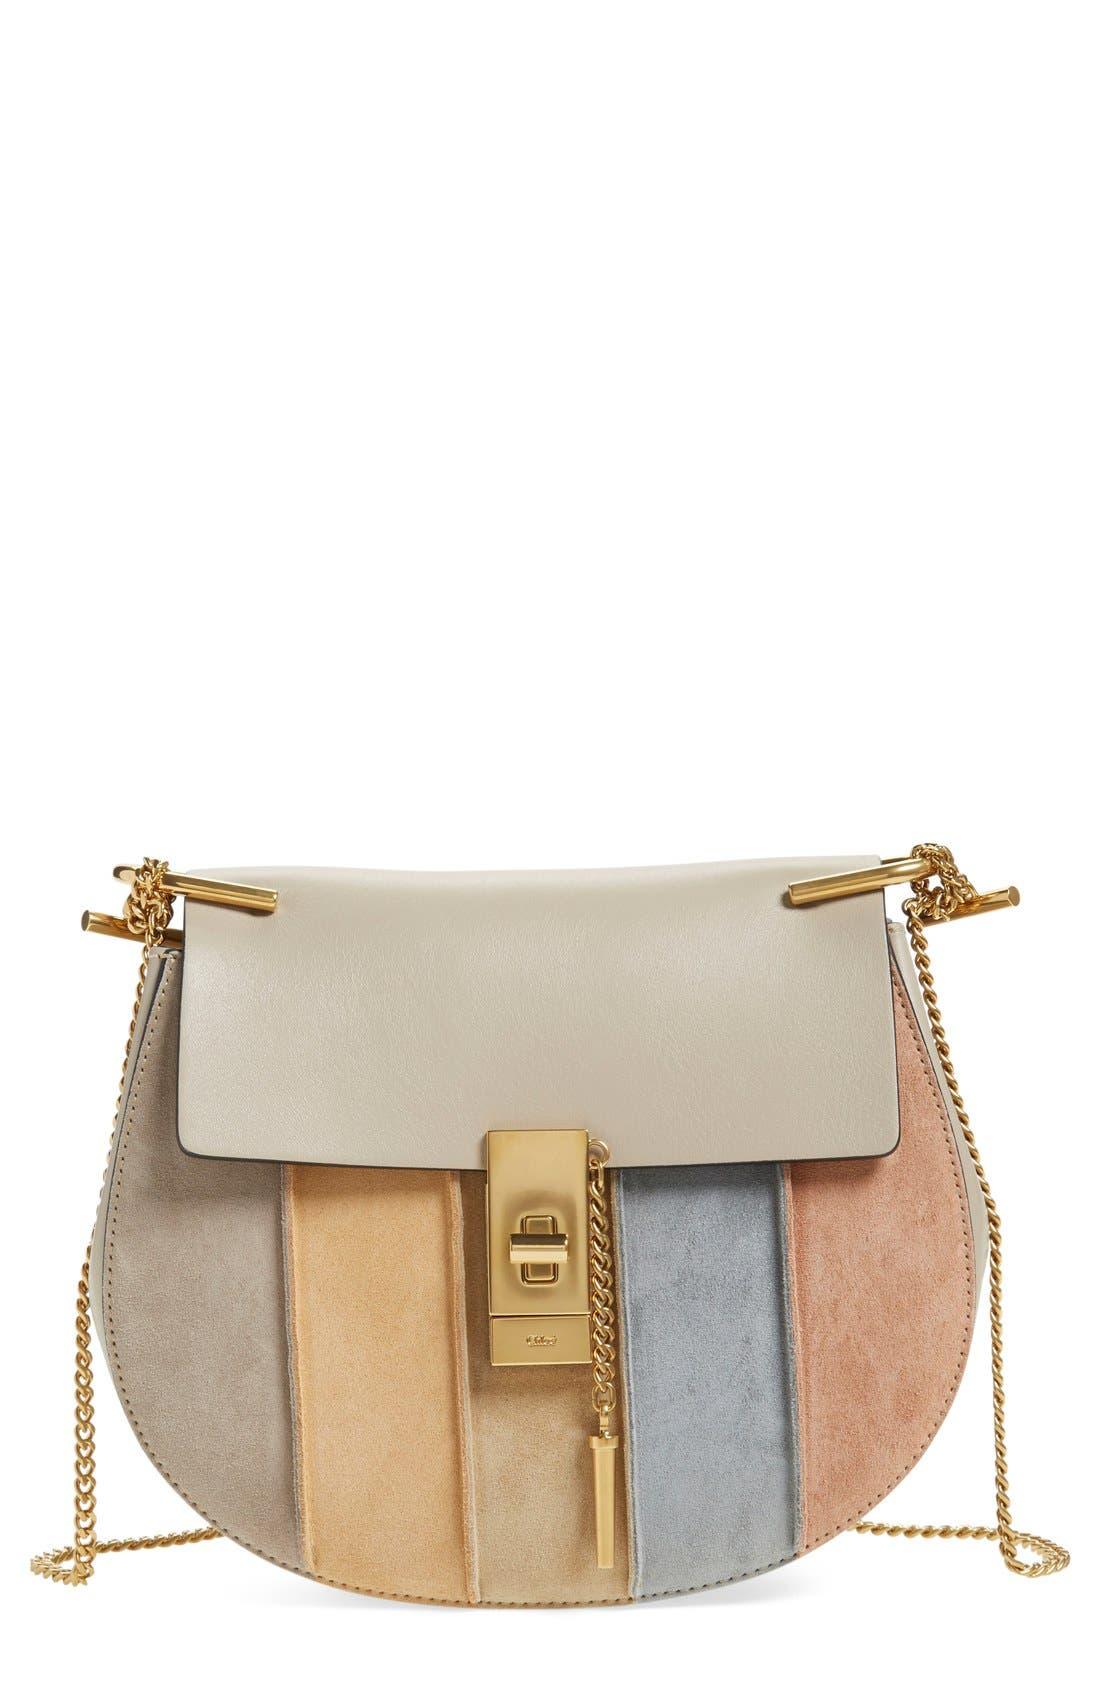 Main Image - Chloé 'Small Drew' Suede Stripe Shoulder Bag